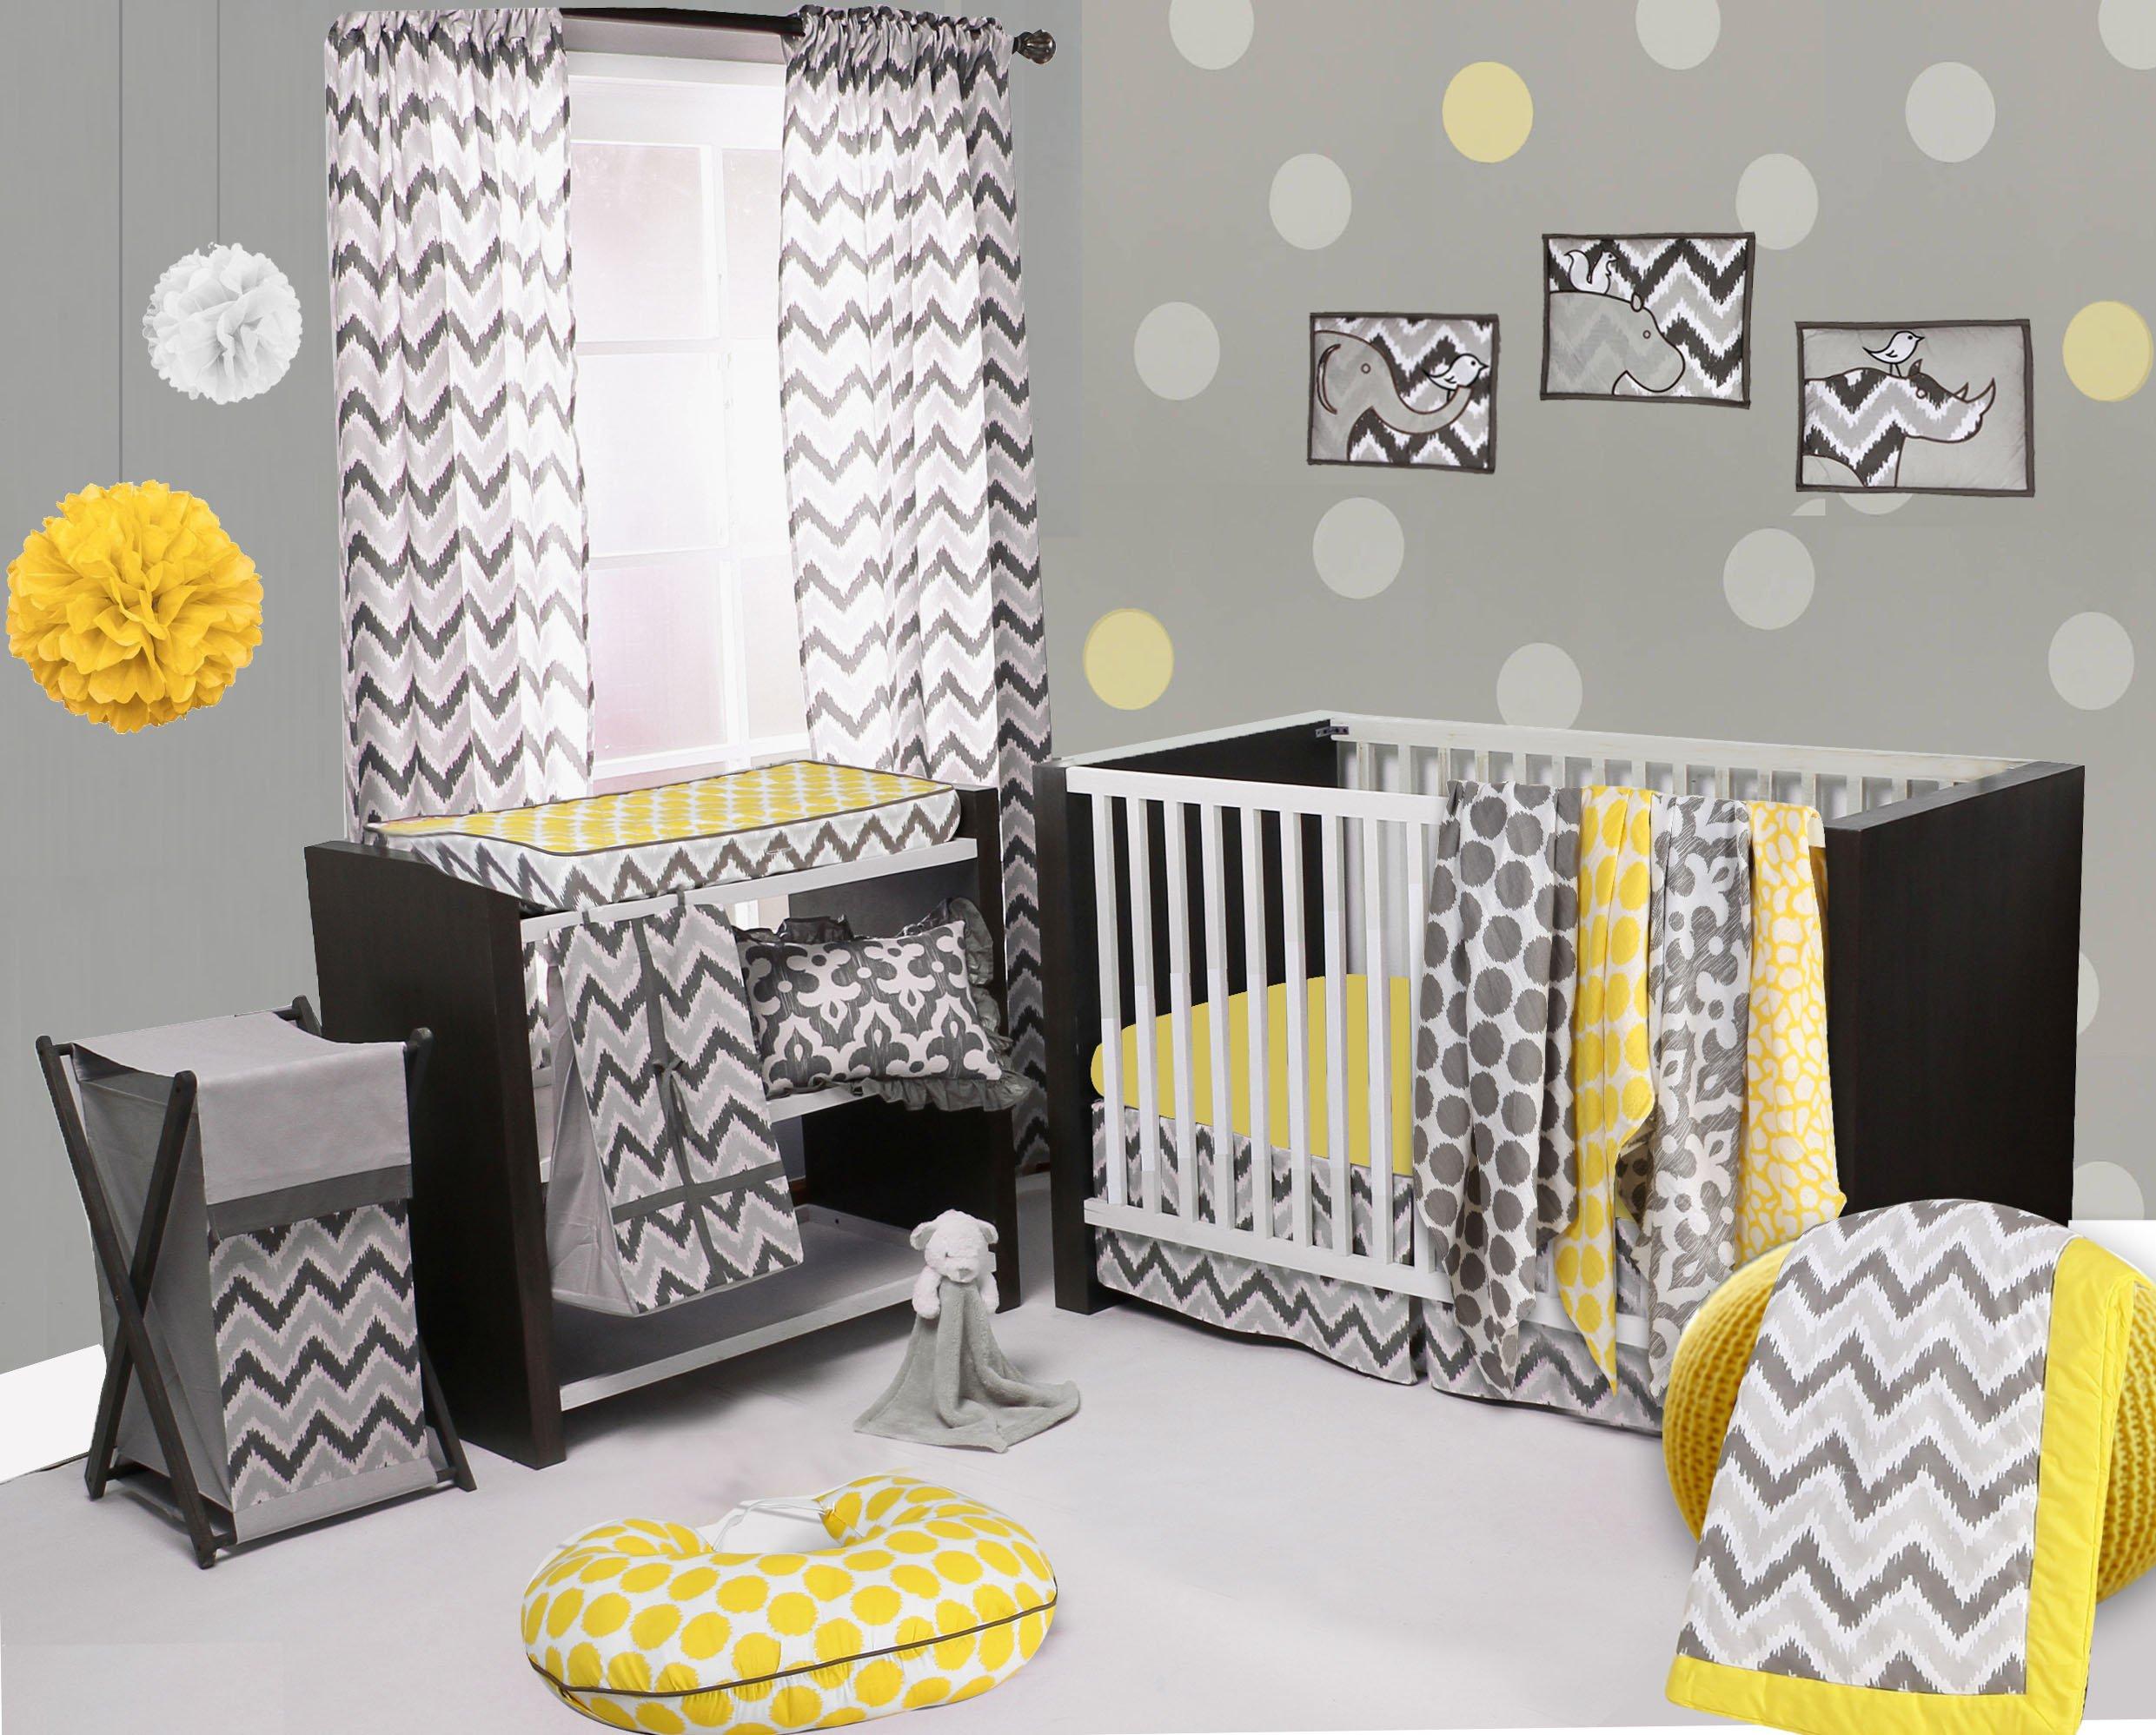 Bacati Ikat Chevron Muslin 10 Piece Crib Set with 2 Sheets, Yellow/Grey